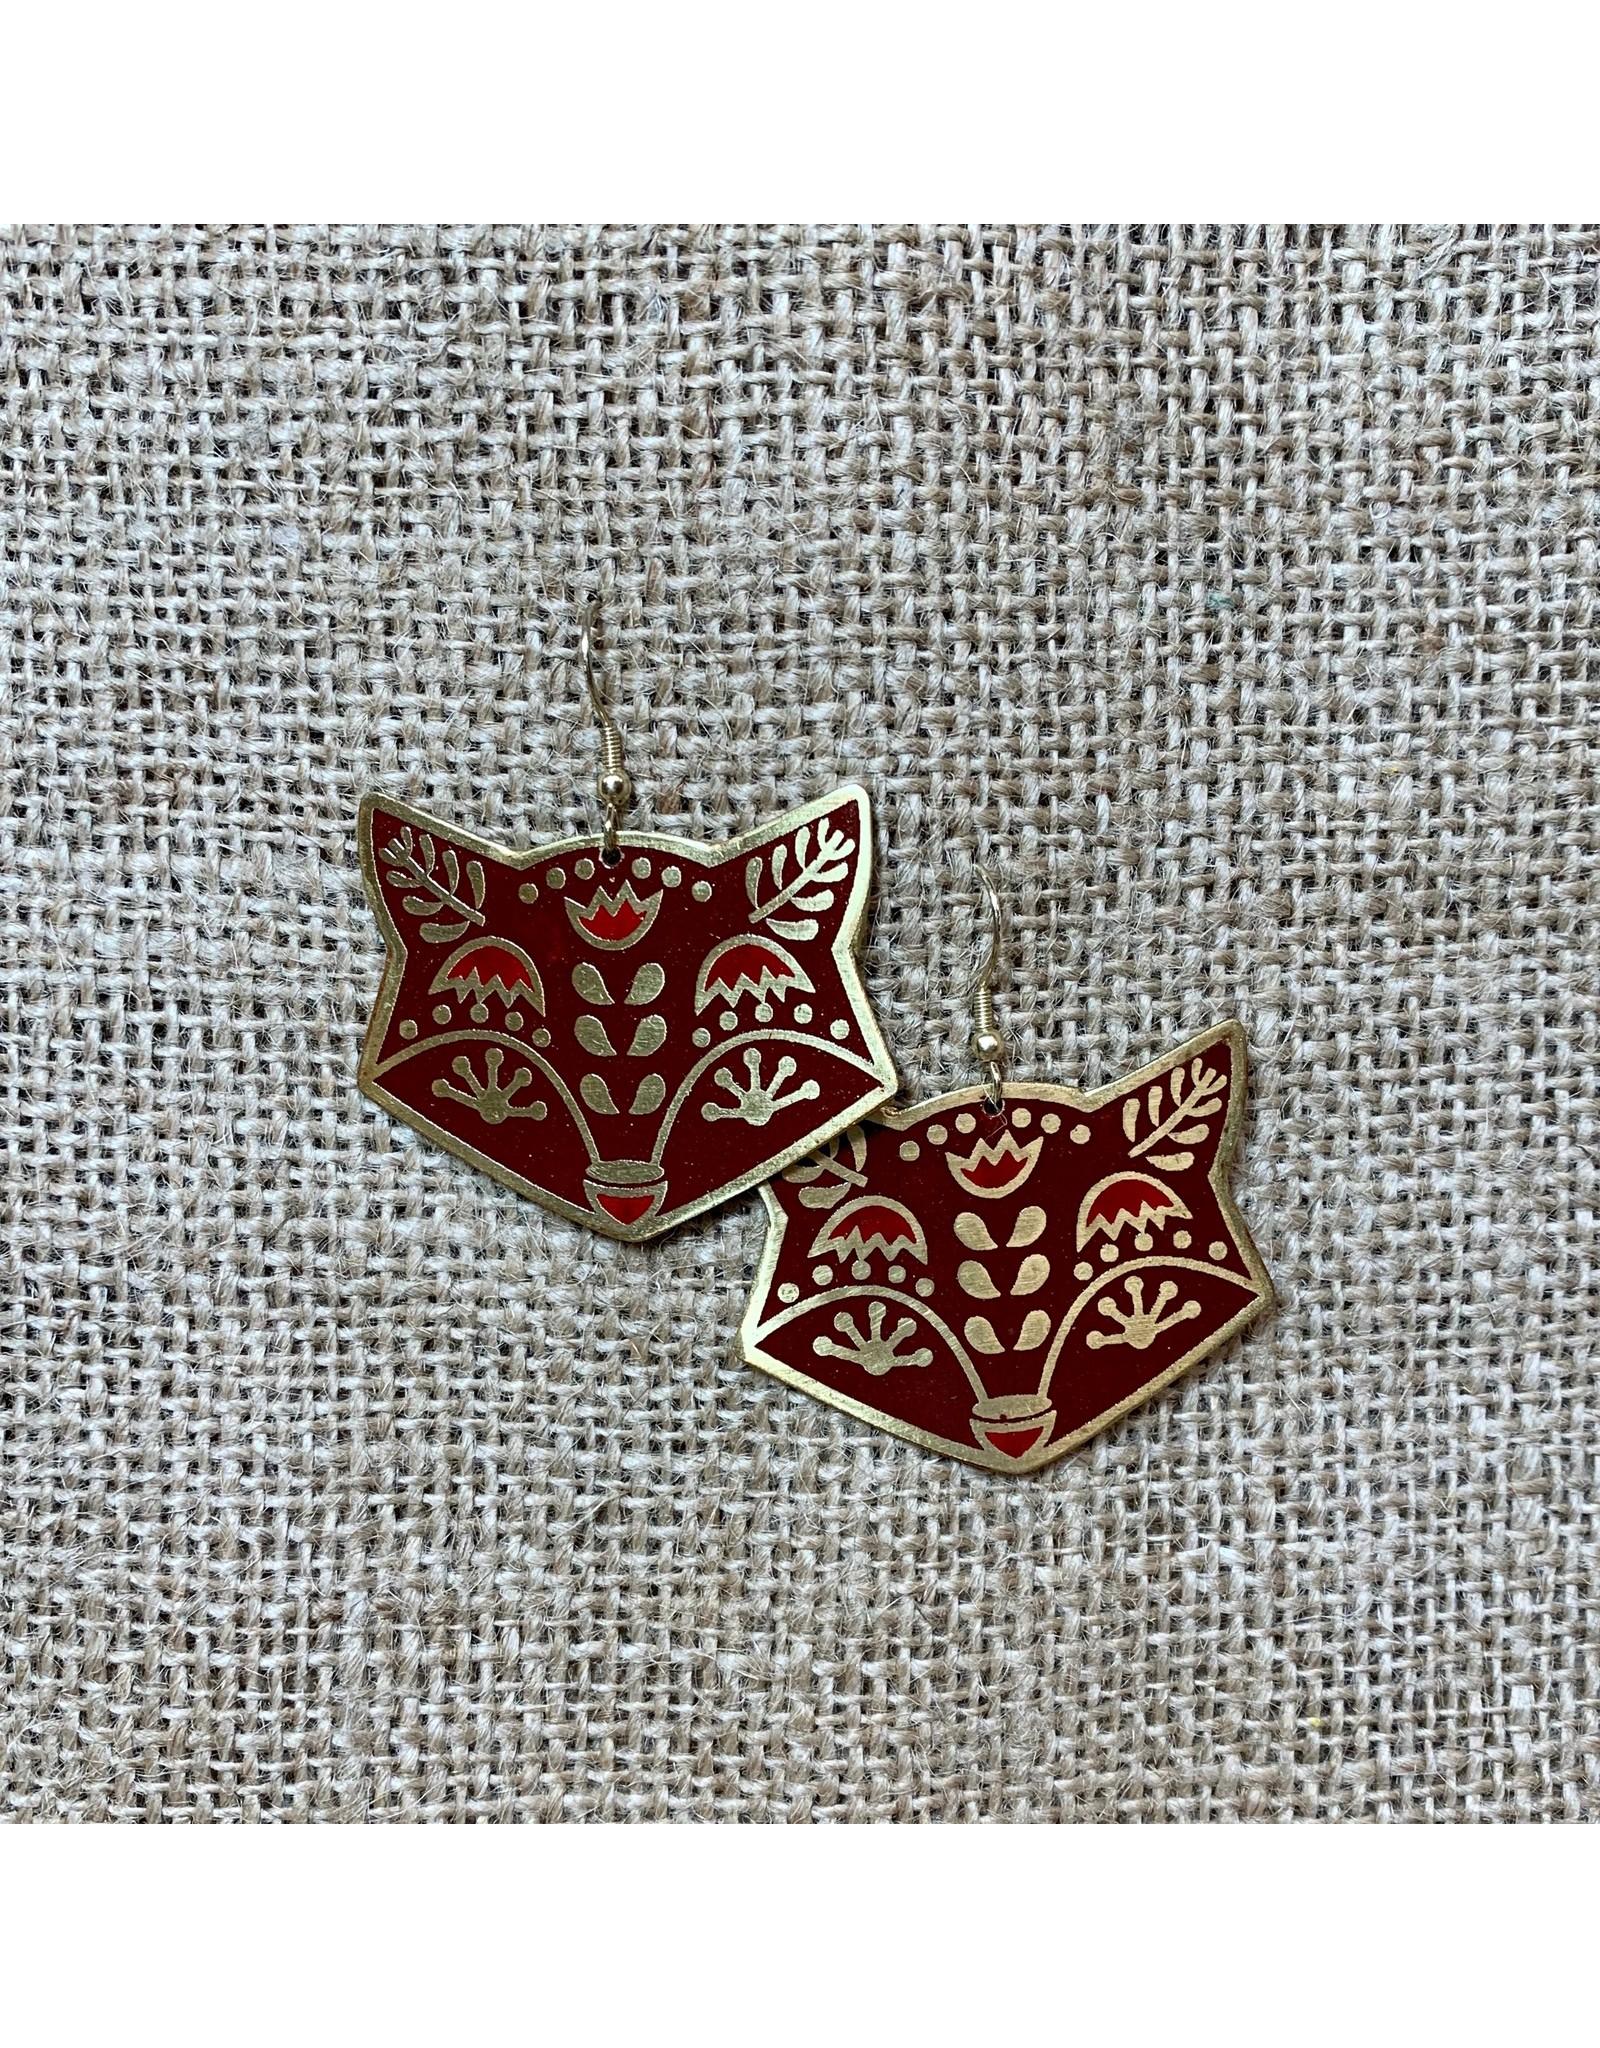 Earrings Fox Trot, Red, India